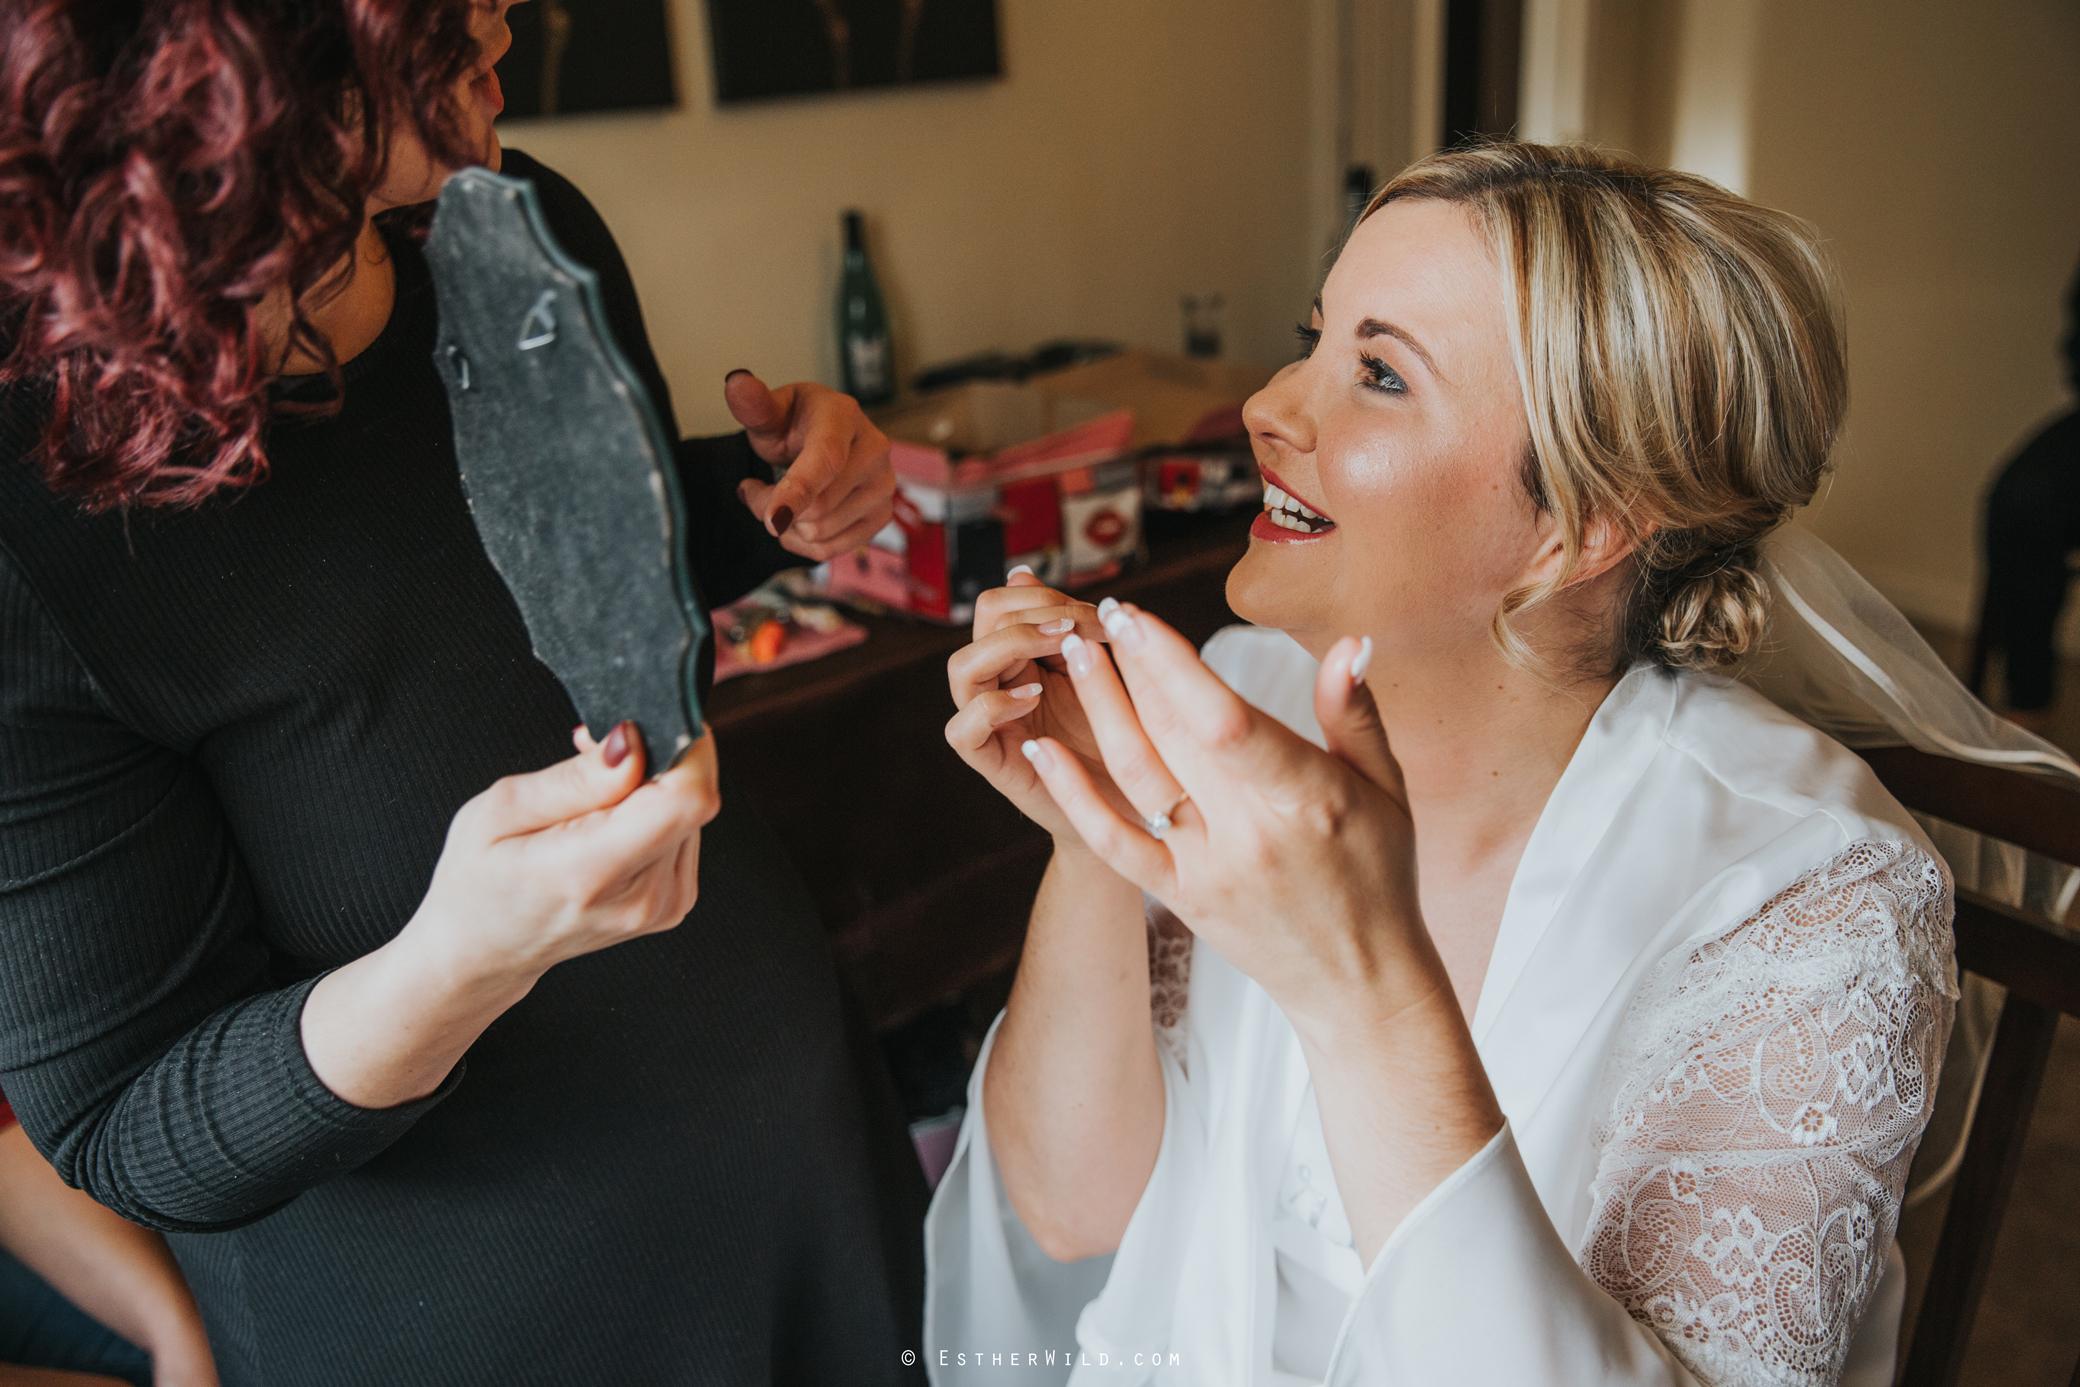 Wedding_Kings_Lynn_Town_Hall_Norfolk_Photographer_Esther_Wild_IMG_0392.jpg